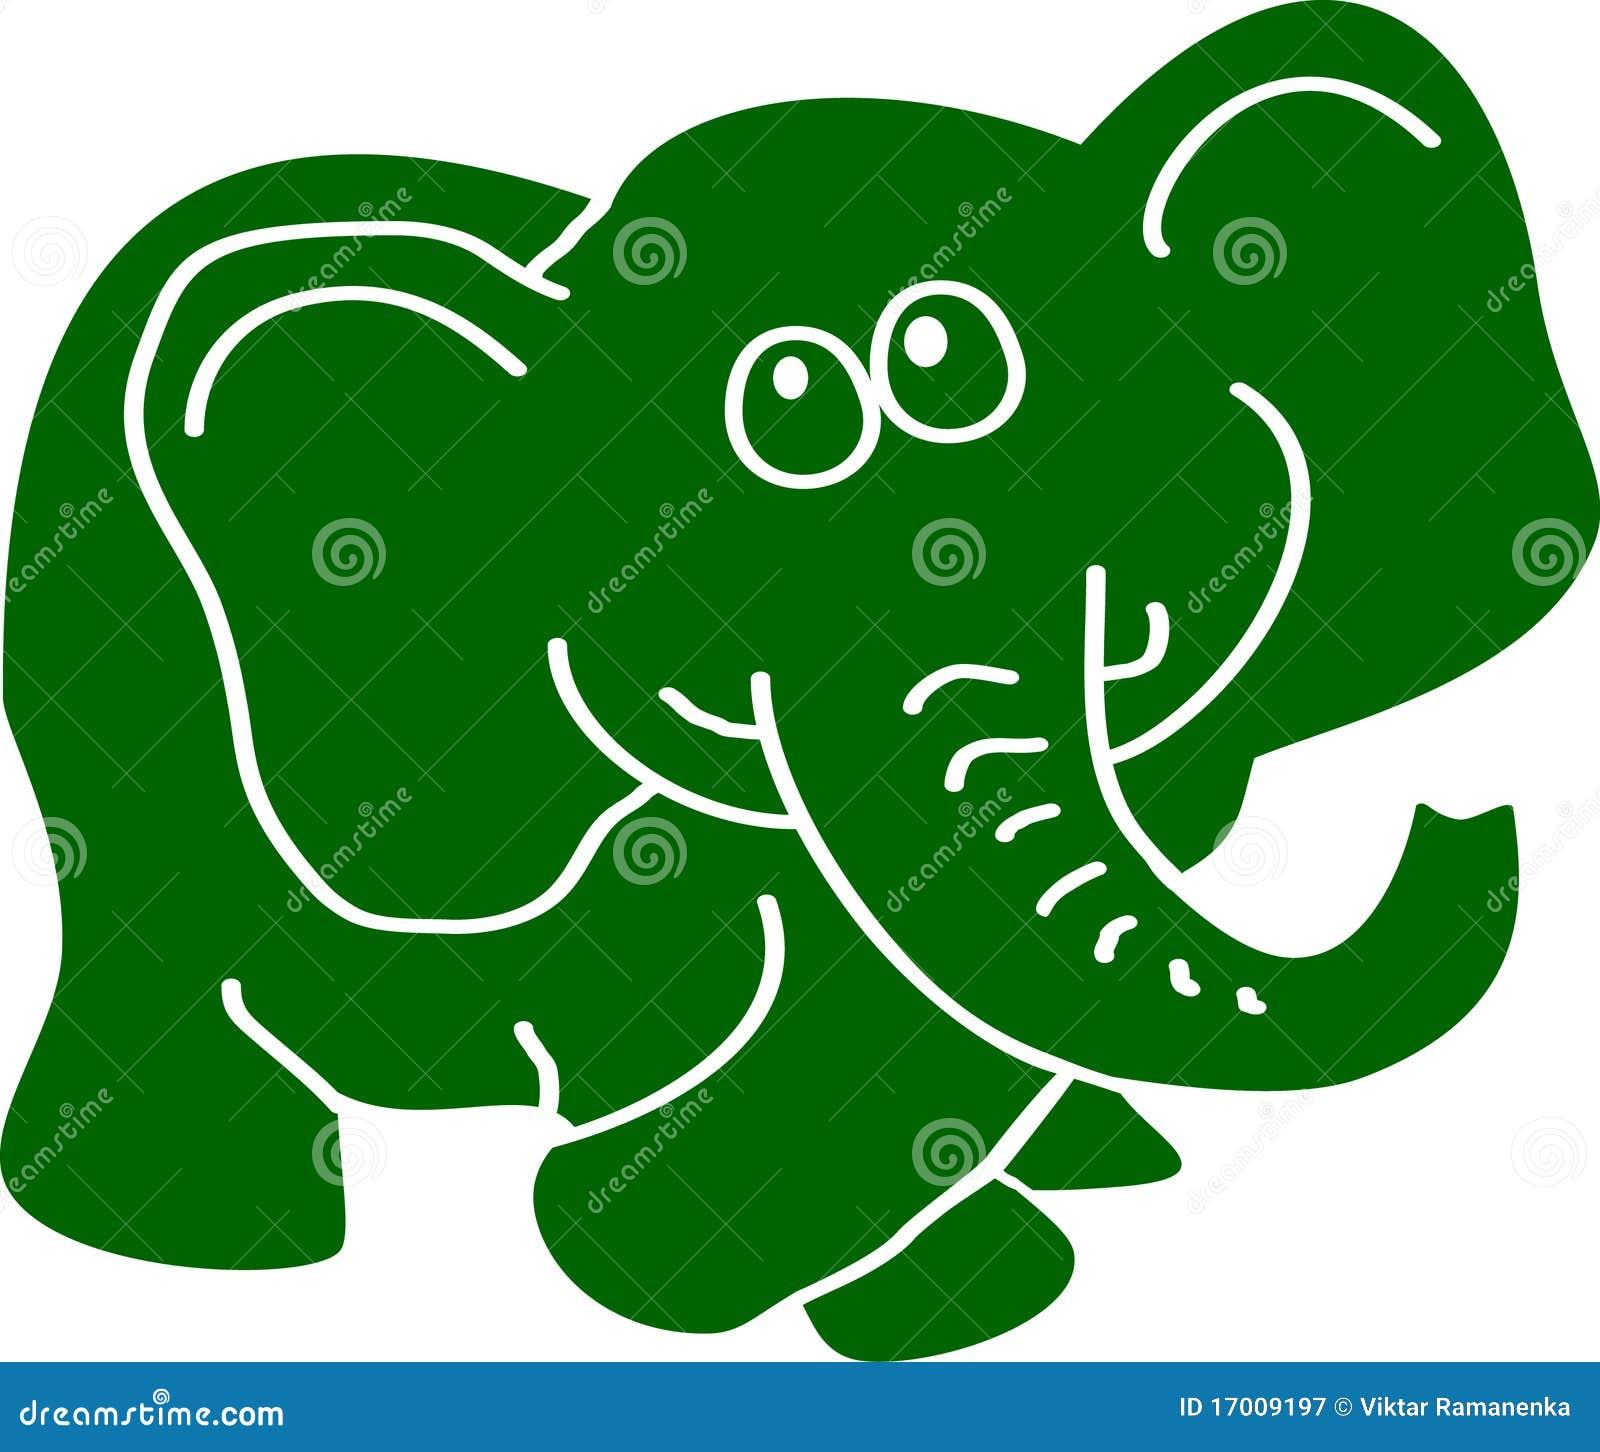 dark green elephant simple illustration mr no pr no 2 894 4